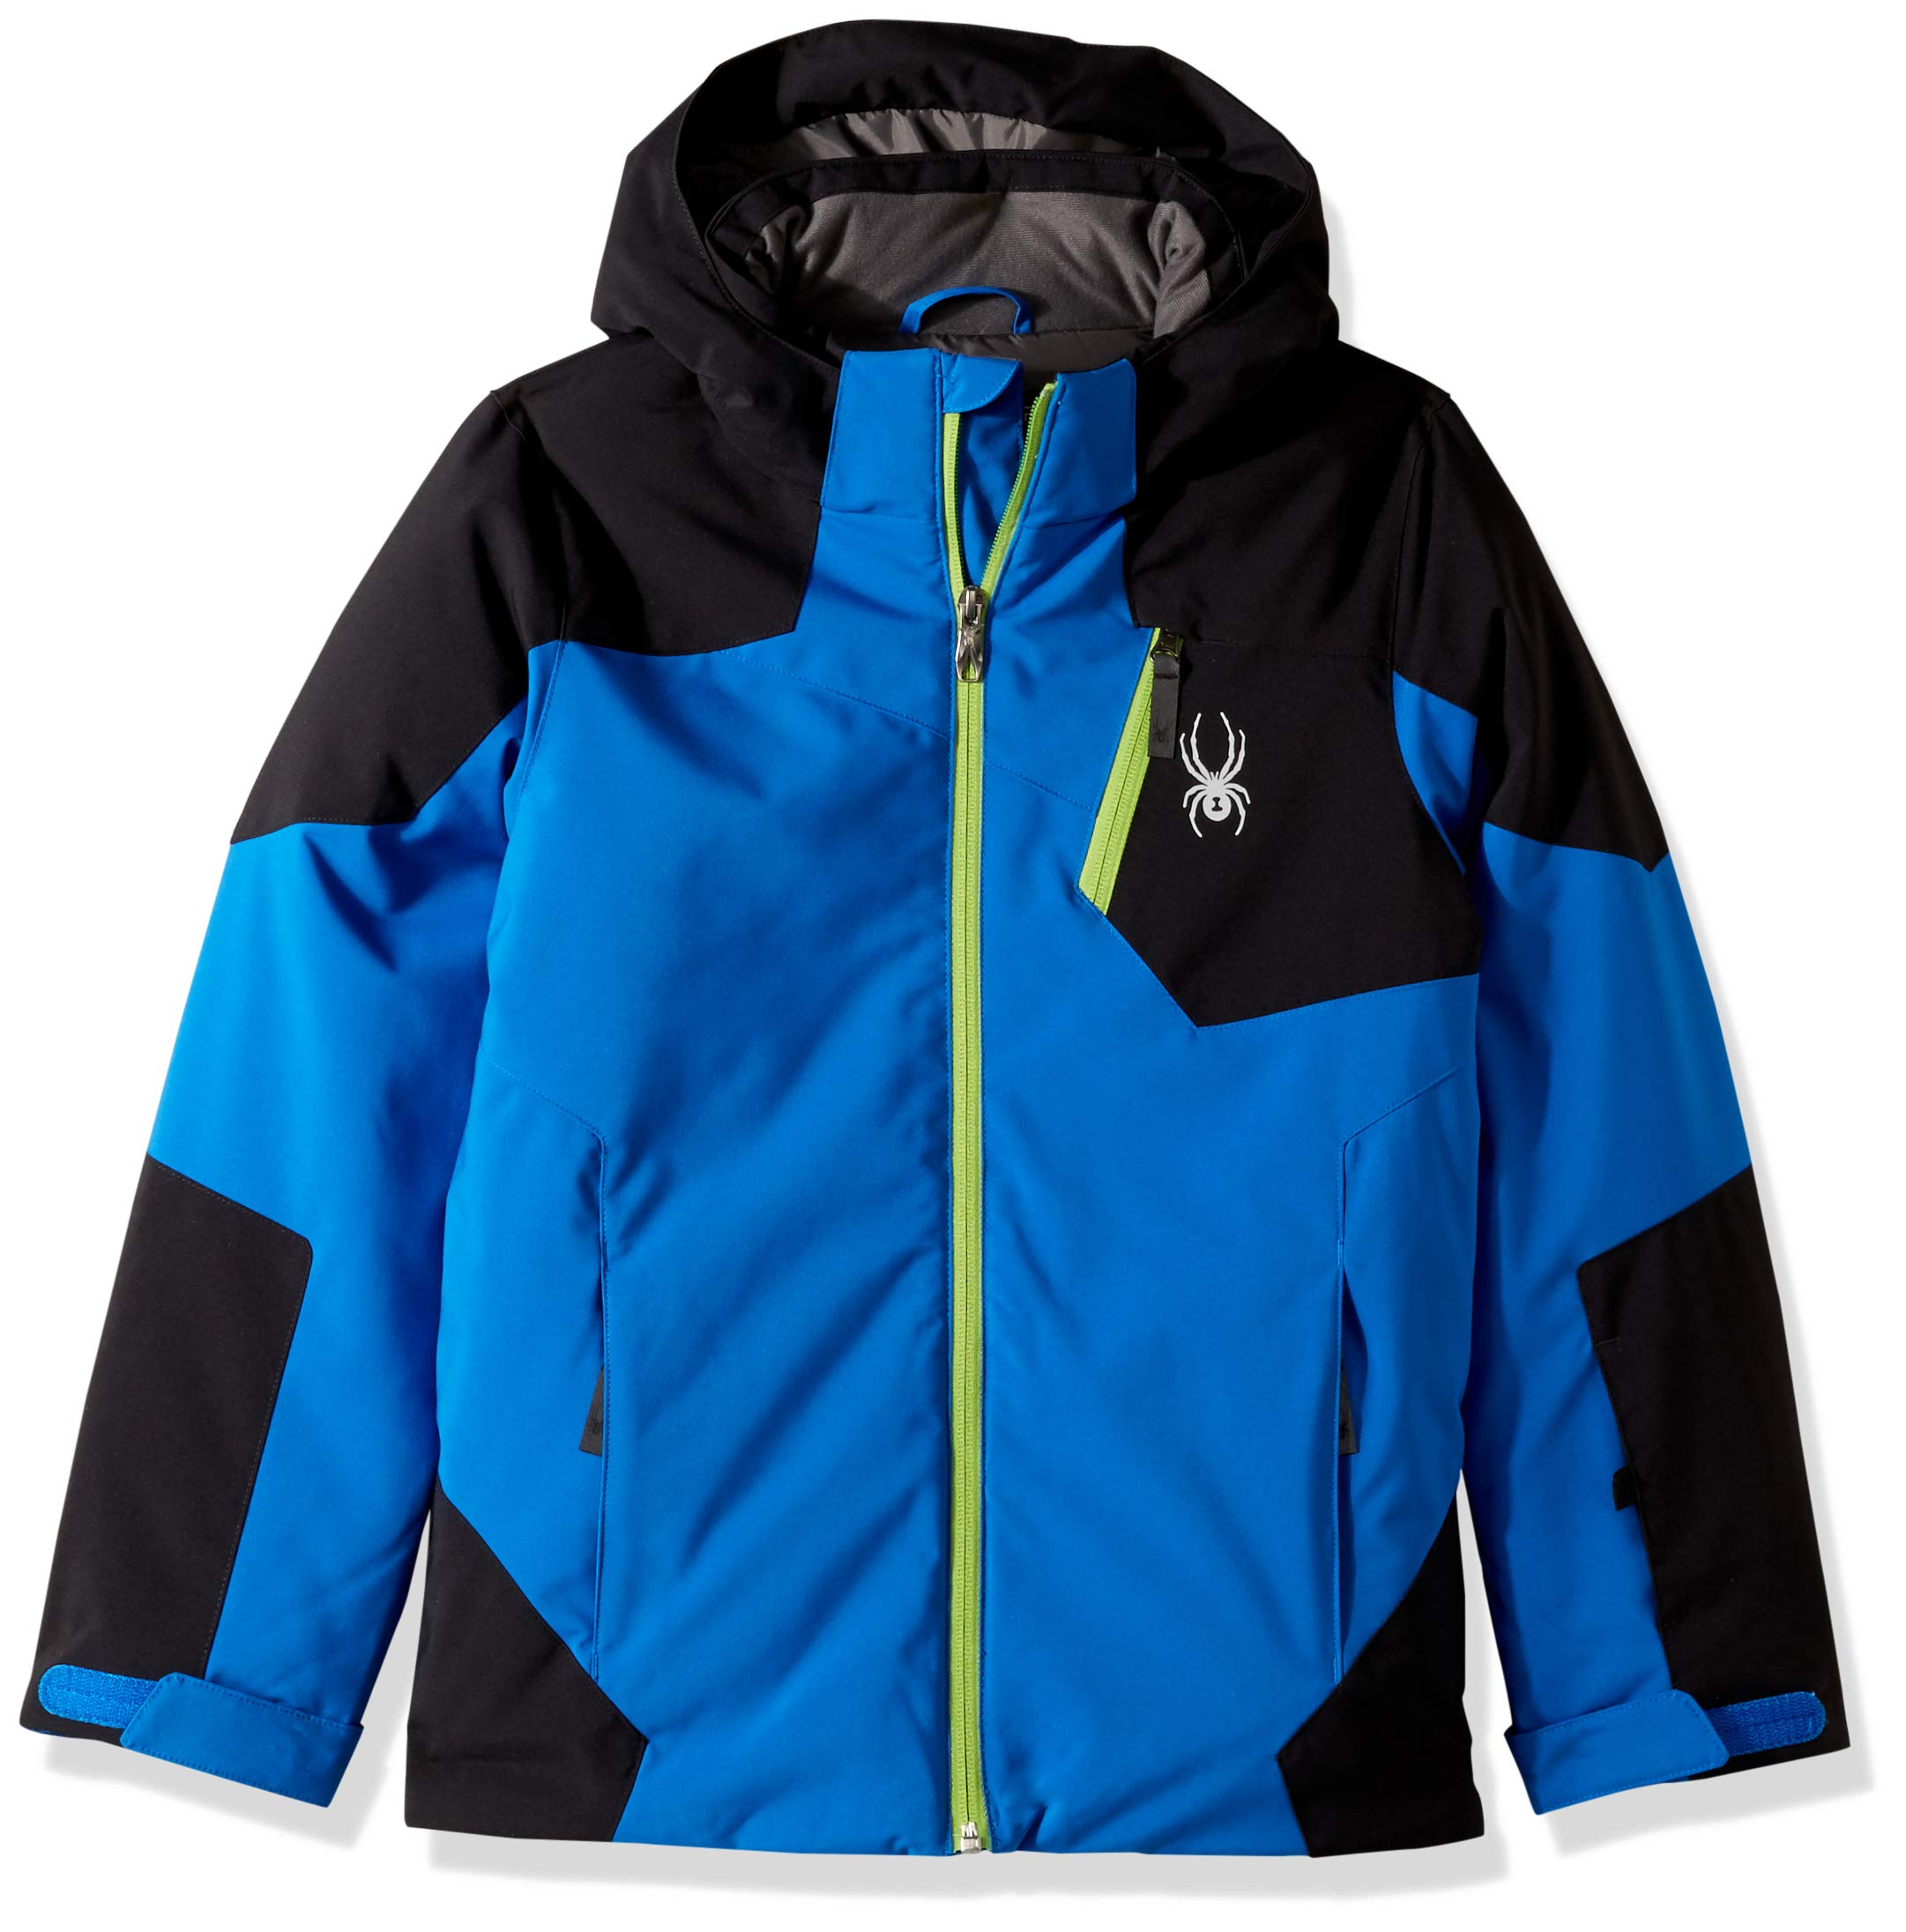 Spyder Boys' Chambers Ski Jacket, Turkish Sea/Black/Fresh, Size 10